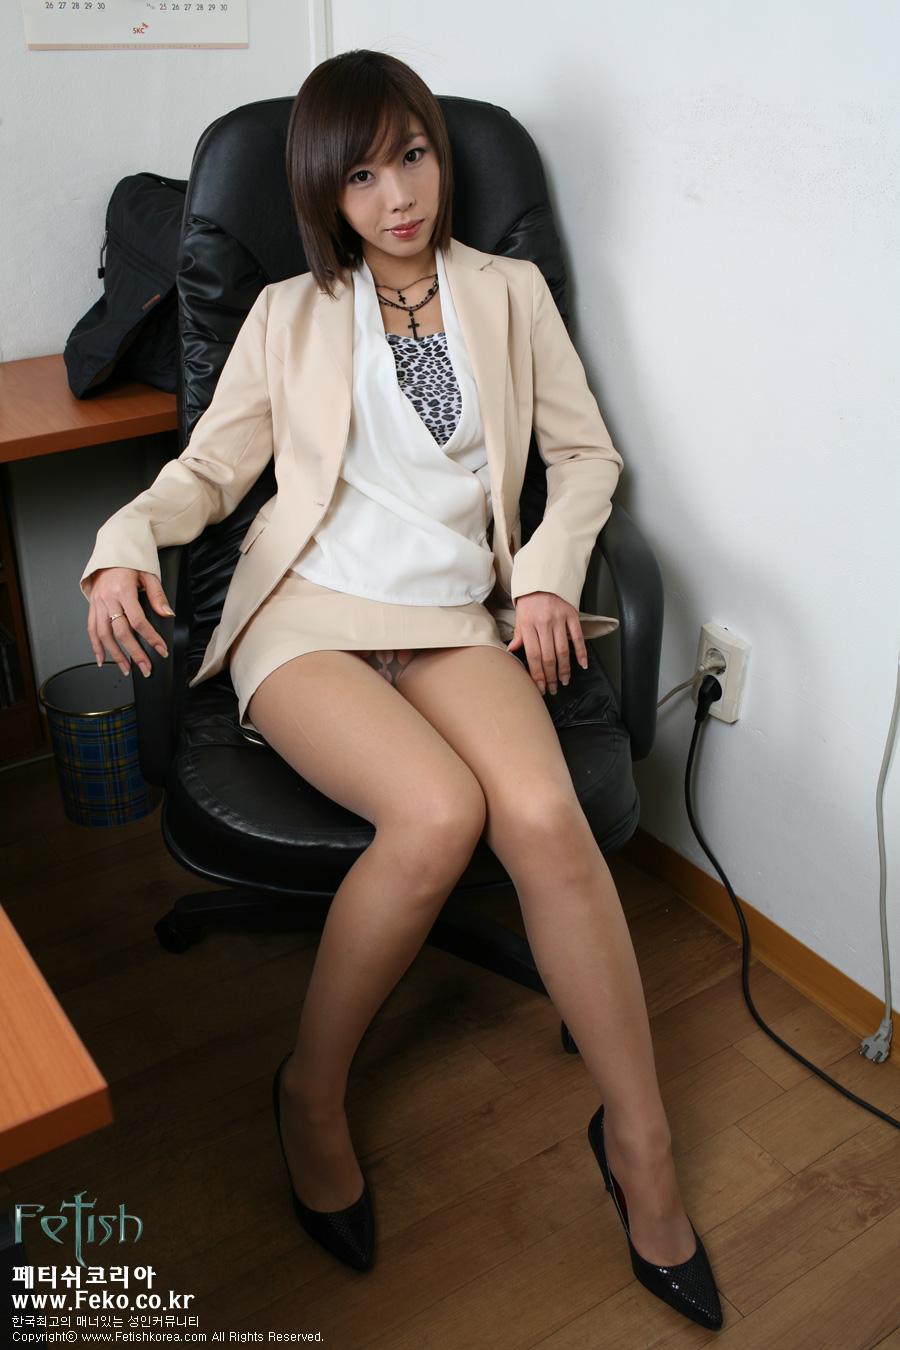 ... girls stockings Photo Series [Fetishkorea] NFG 5[144P] | PhimVu Blog